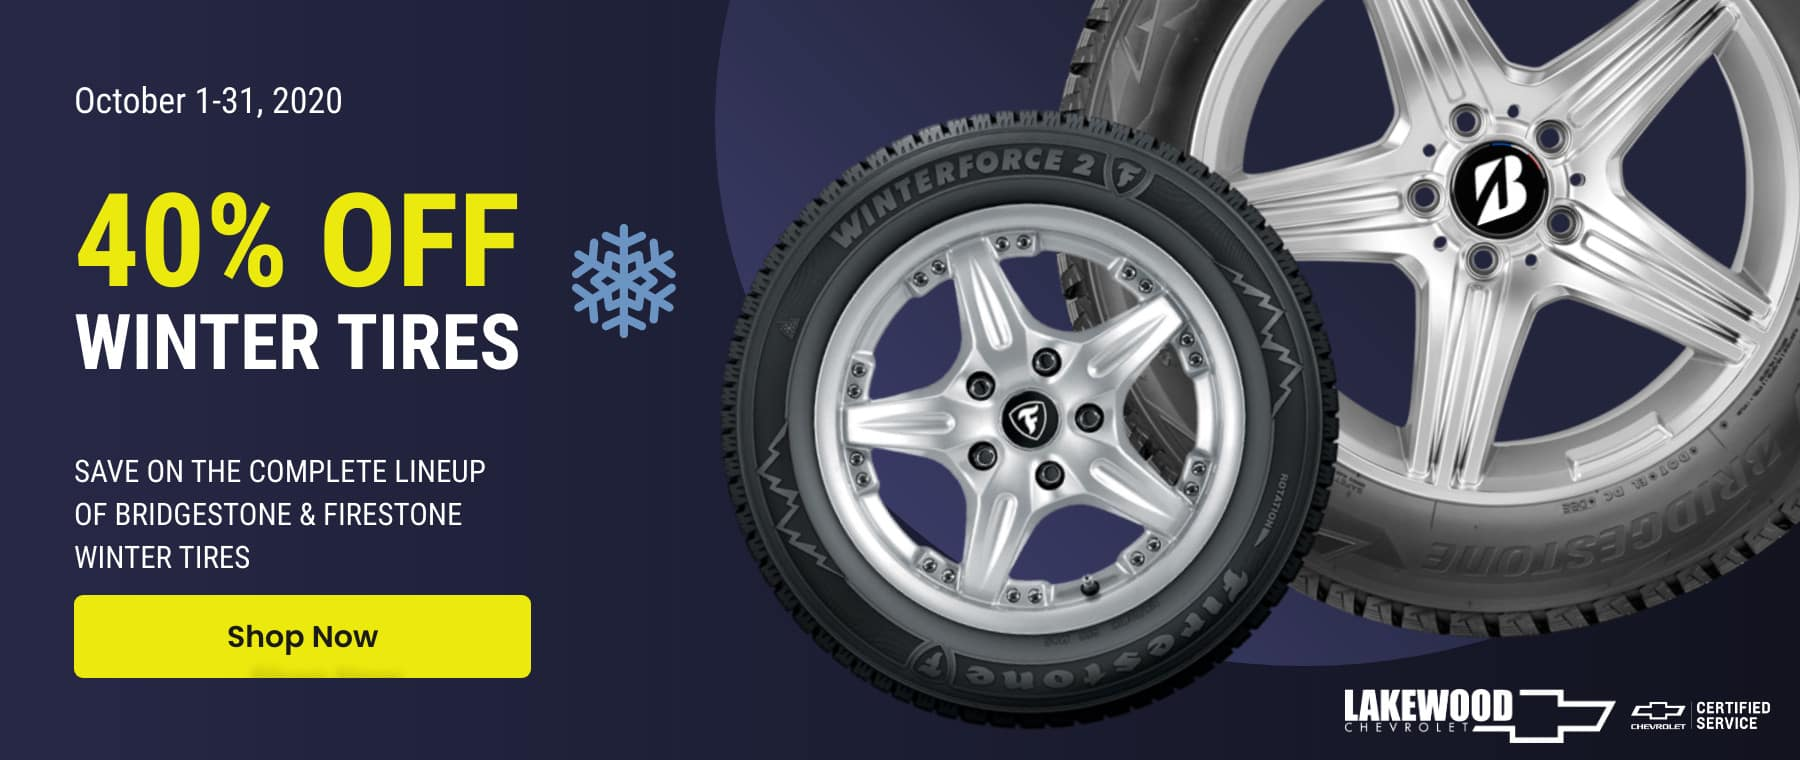 Lakewood Chevrolet Winter Tire Sale